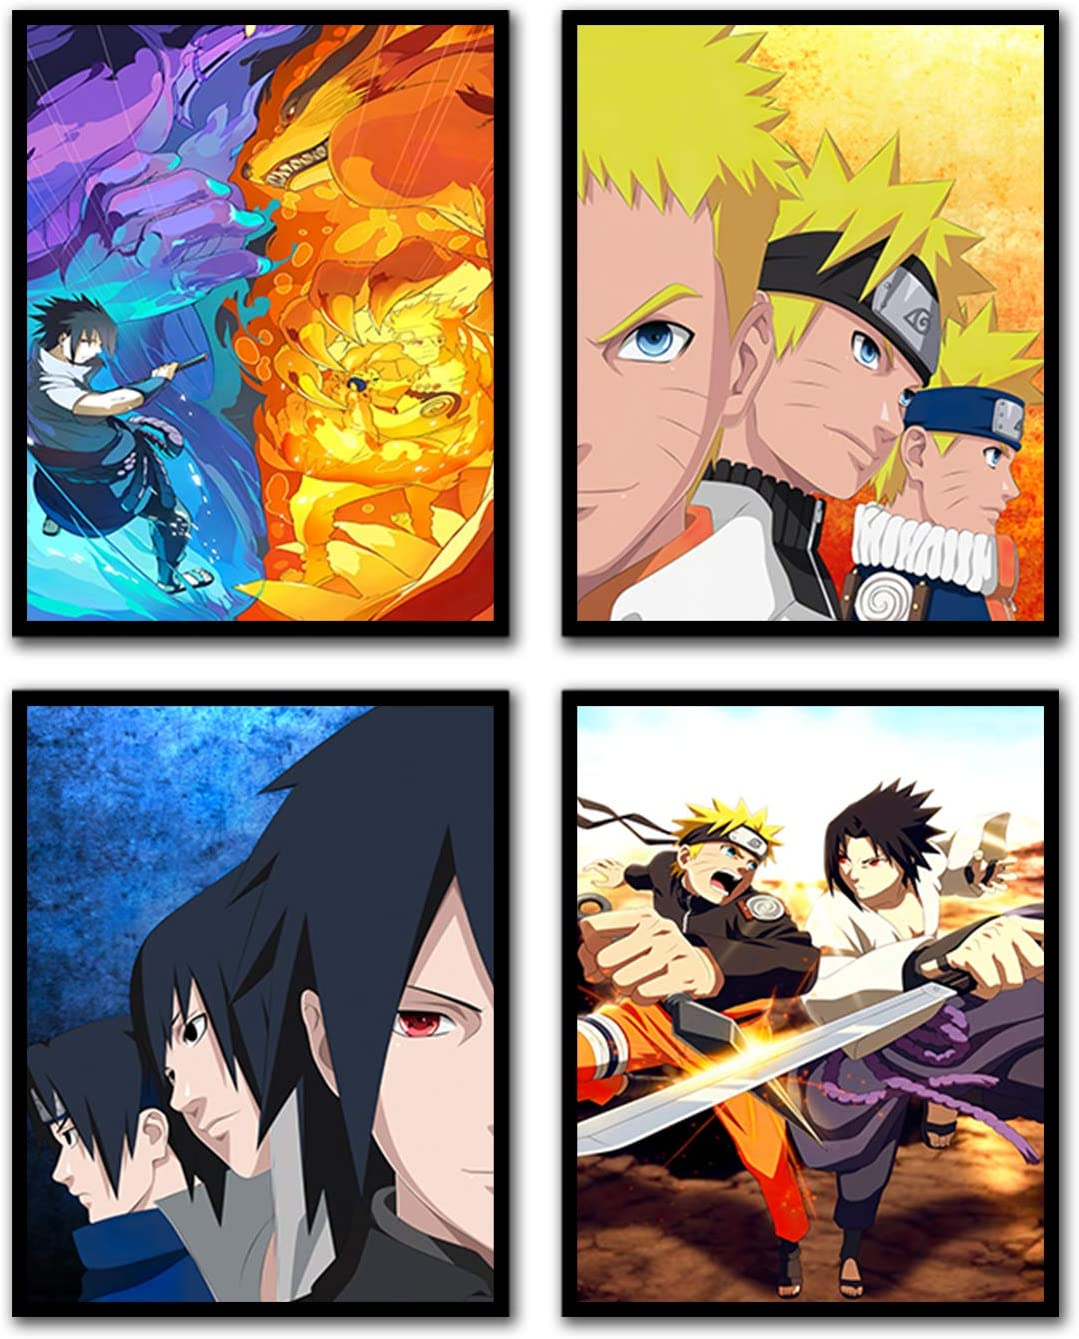 Japanese Manga Naruto Poster Sasuke Wall Pictures for Boys Room Decor 8 x 10 inches Set of 4 (No Frame)